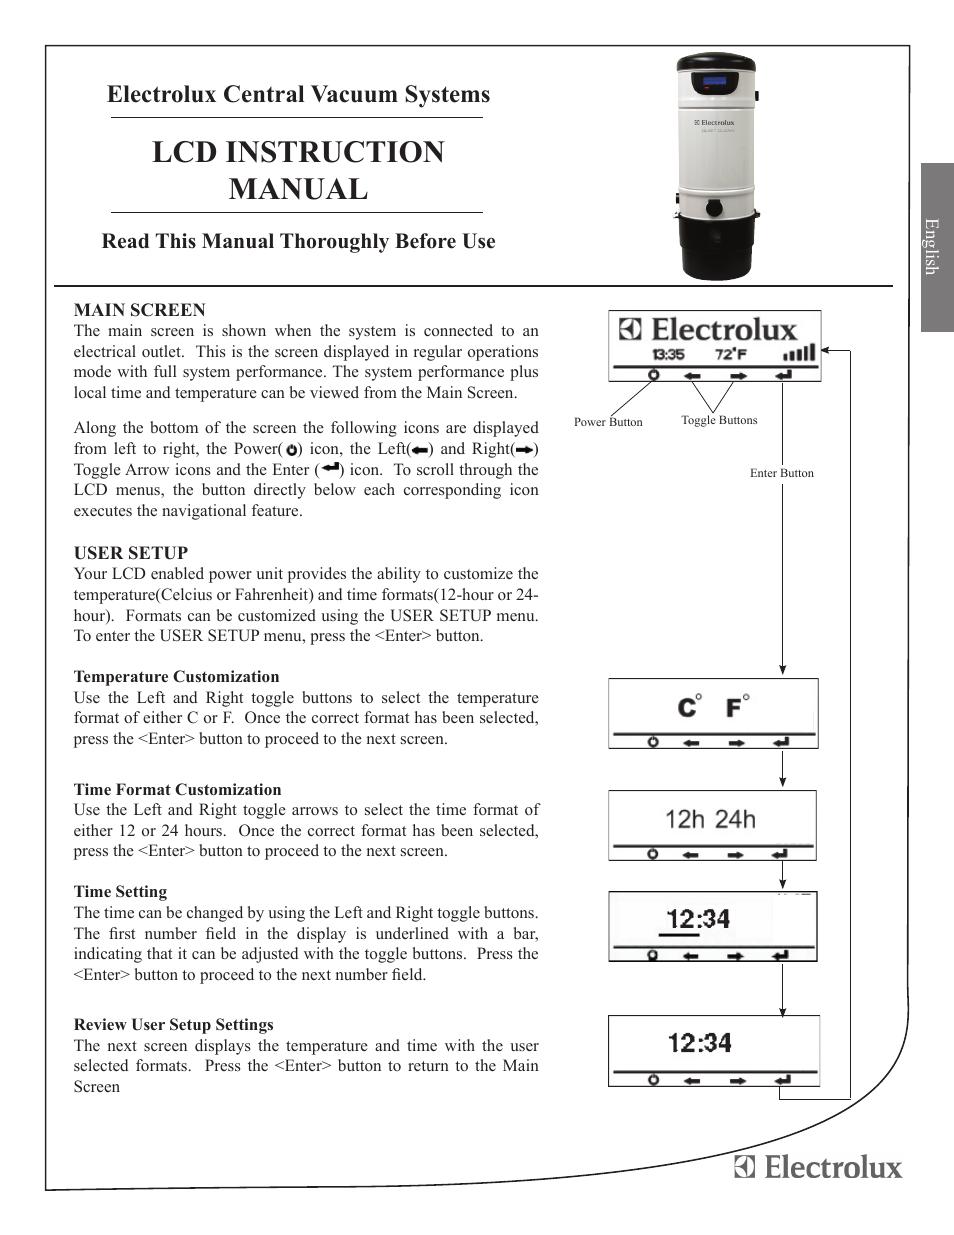 electrolux zcv900 user manual 12 pages original mode rh manualsdir com electrolux vacuum owners manual electrolux canister vacuum owners manual